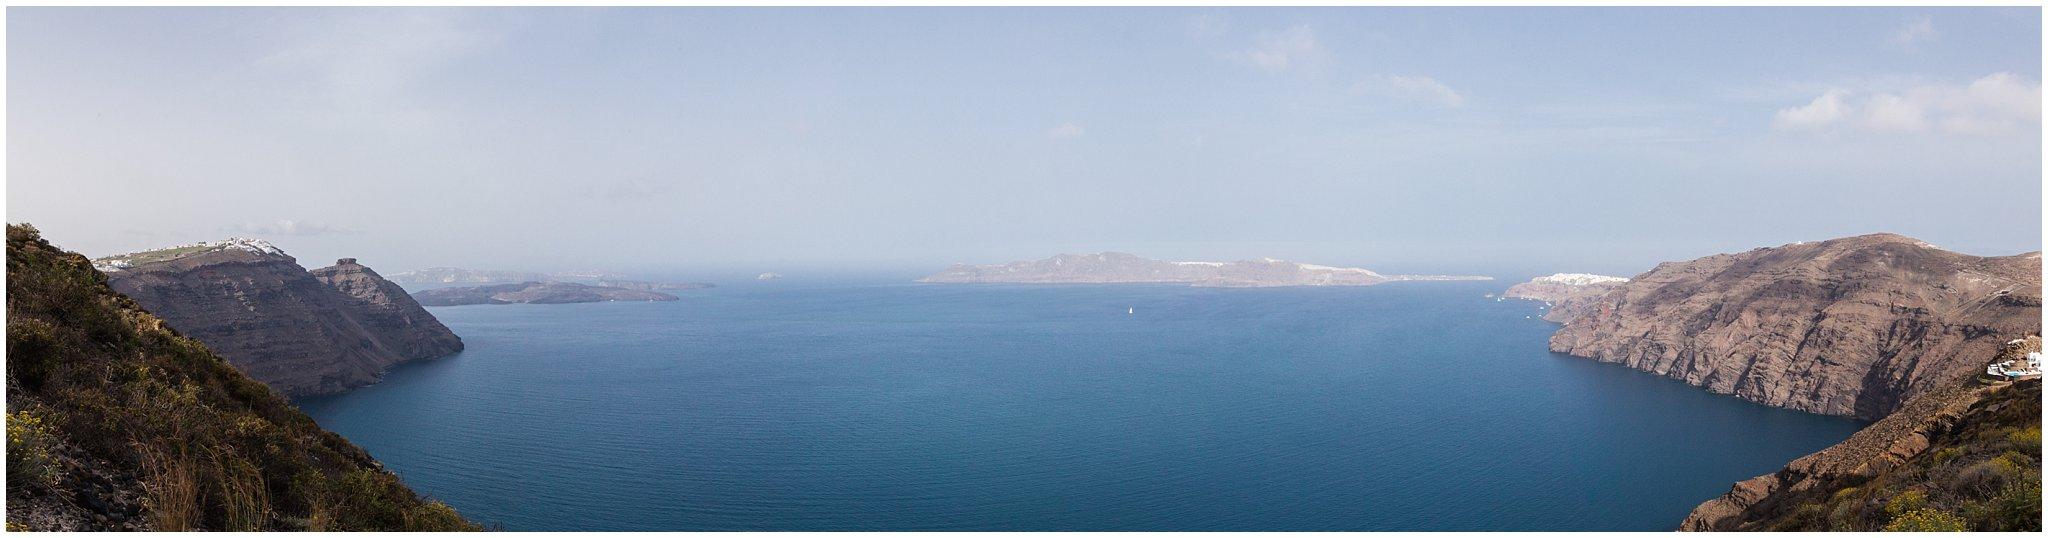 Greece_vacation_0113.jpg